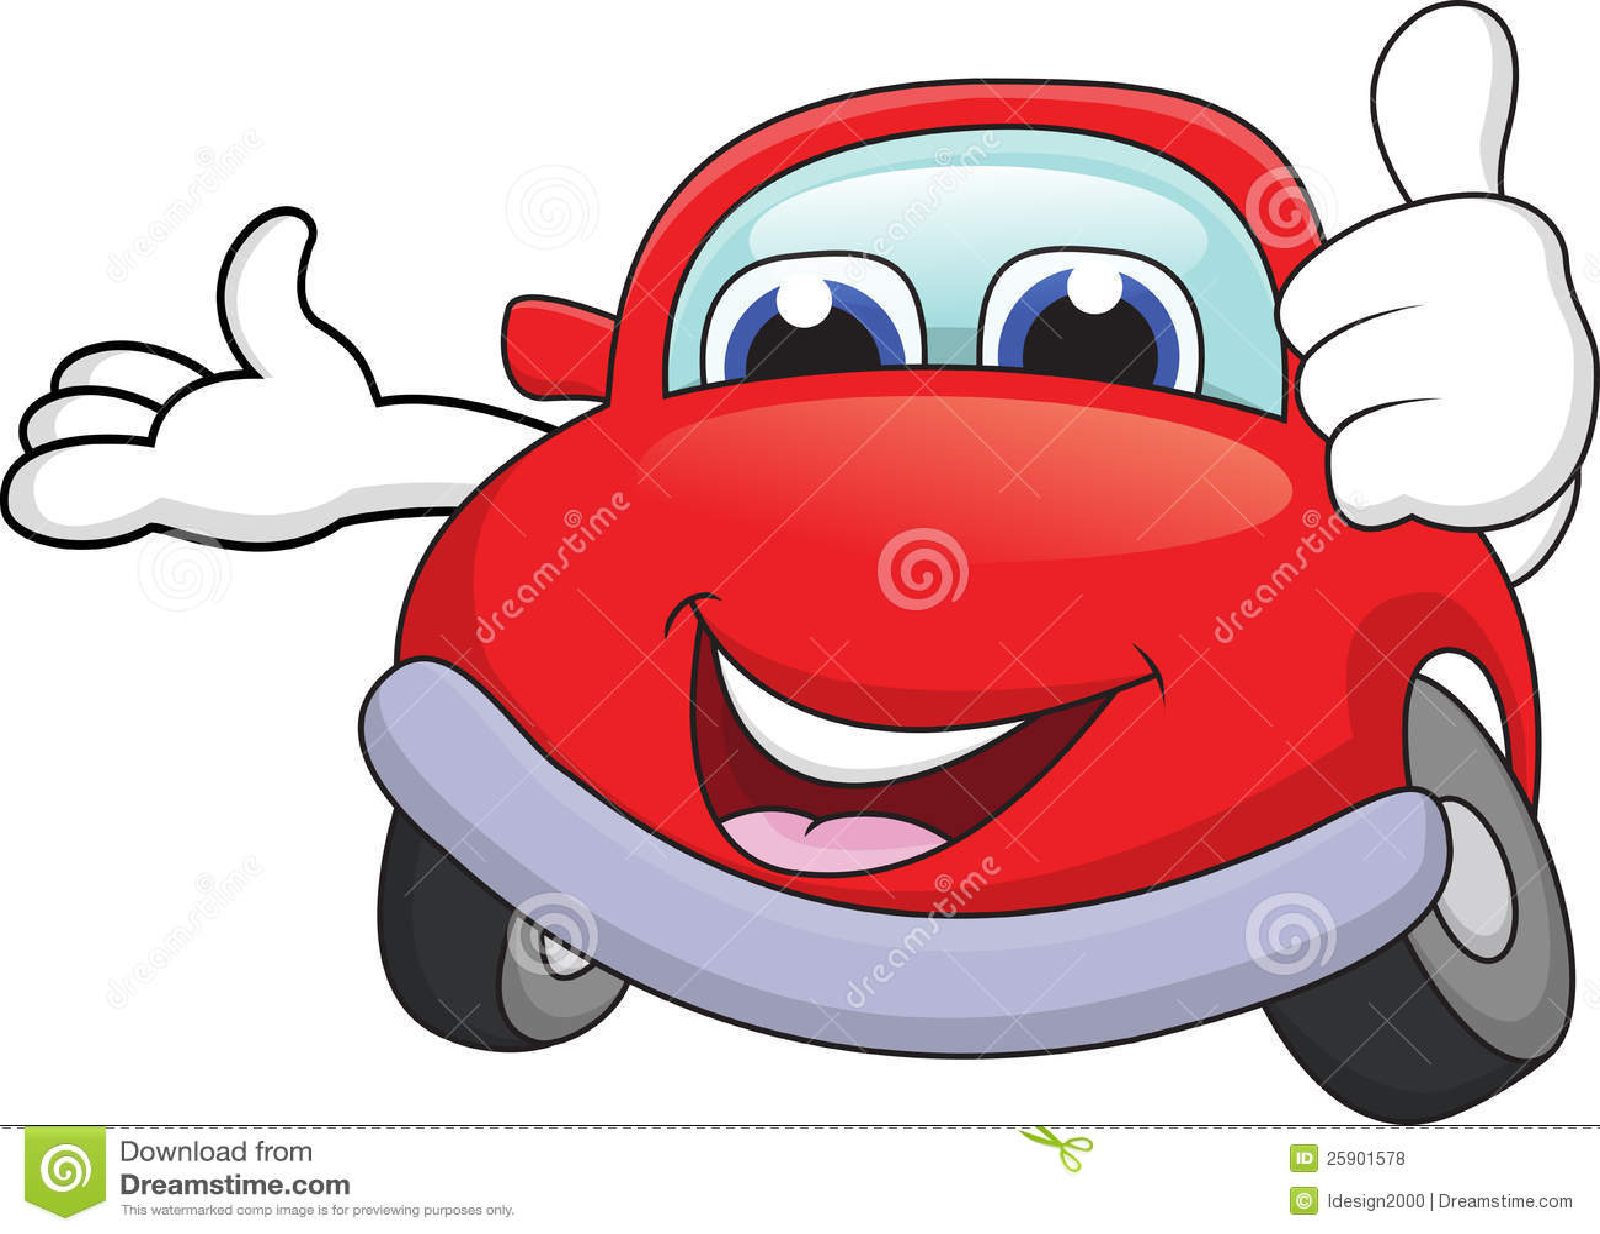 Royalty Free Stock Photos: Car cartoon with thumb up. Image: 25901578